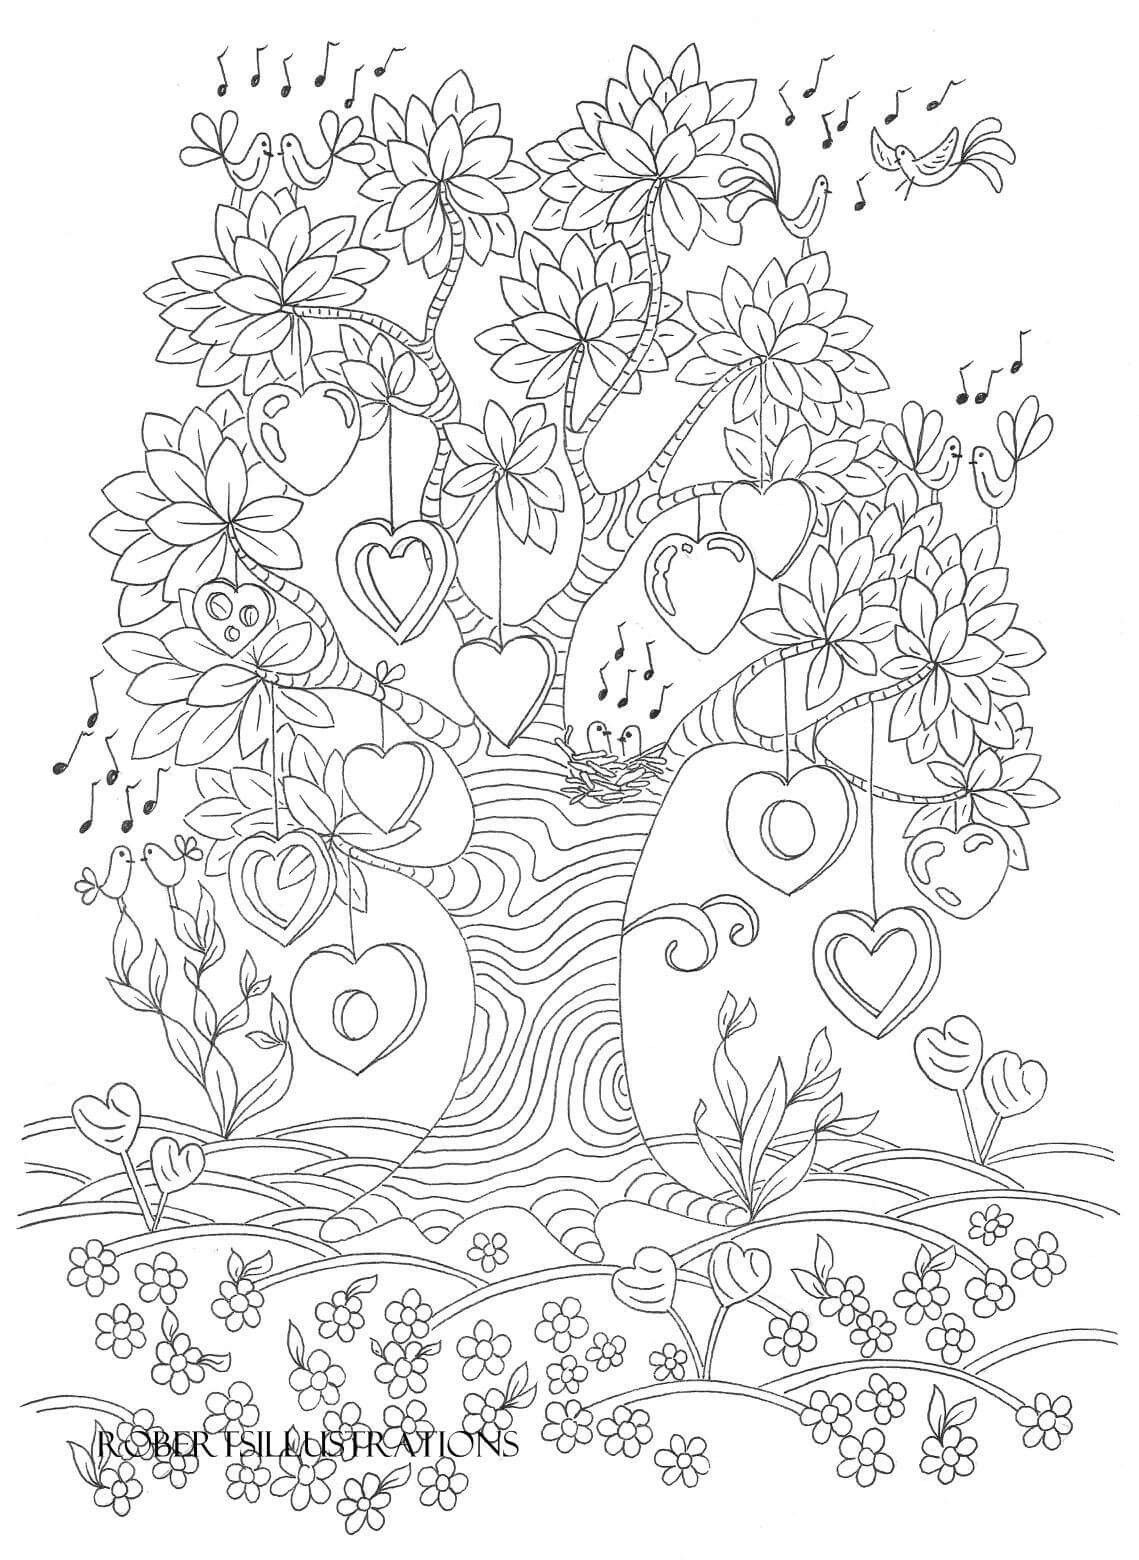 Pin de Rose Mensch en @Art 2@ | Pinterest | Mandalas, Colorear y Dibujo